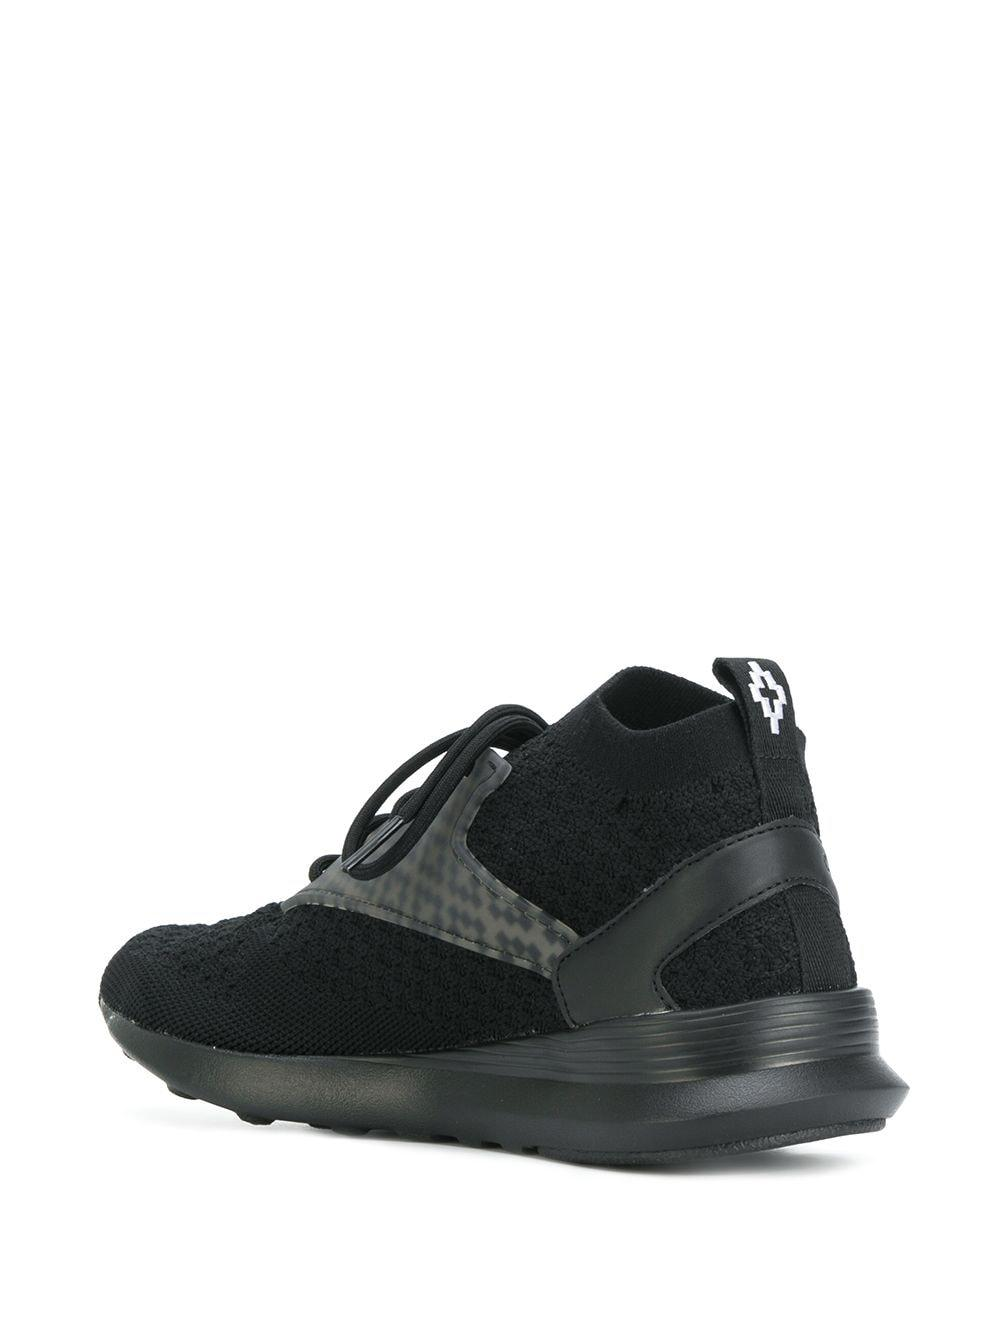 Marcelo Burlon Cotton Zoku Sneakers in Black